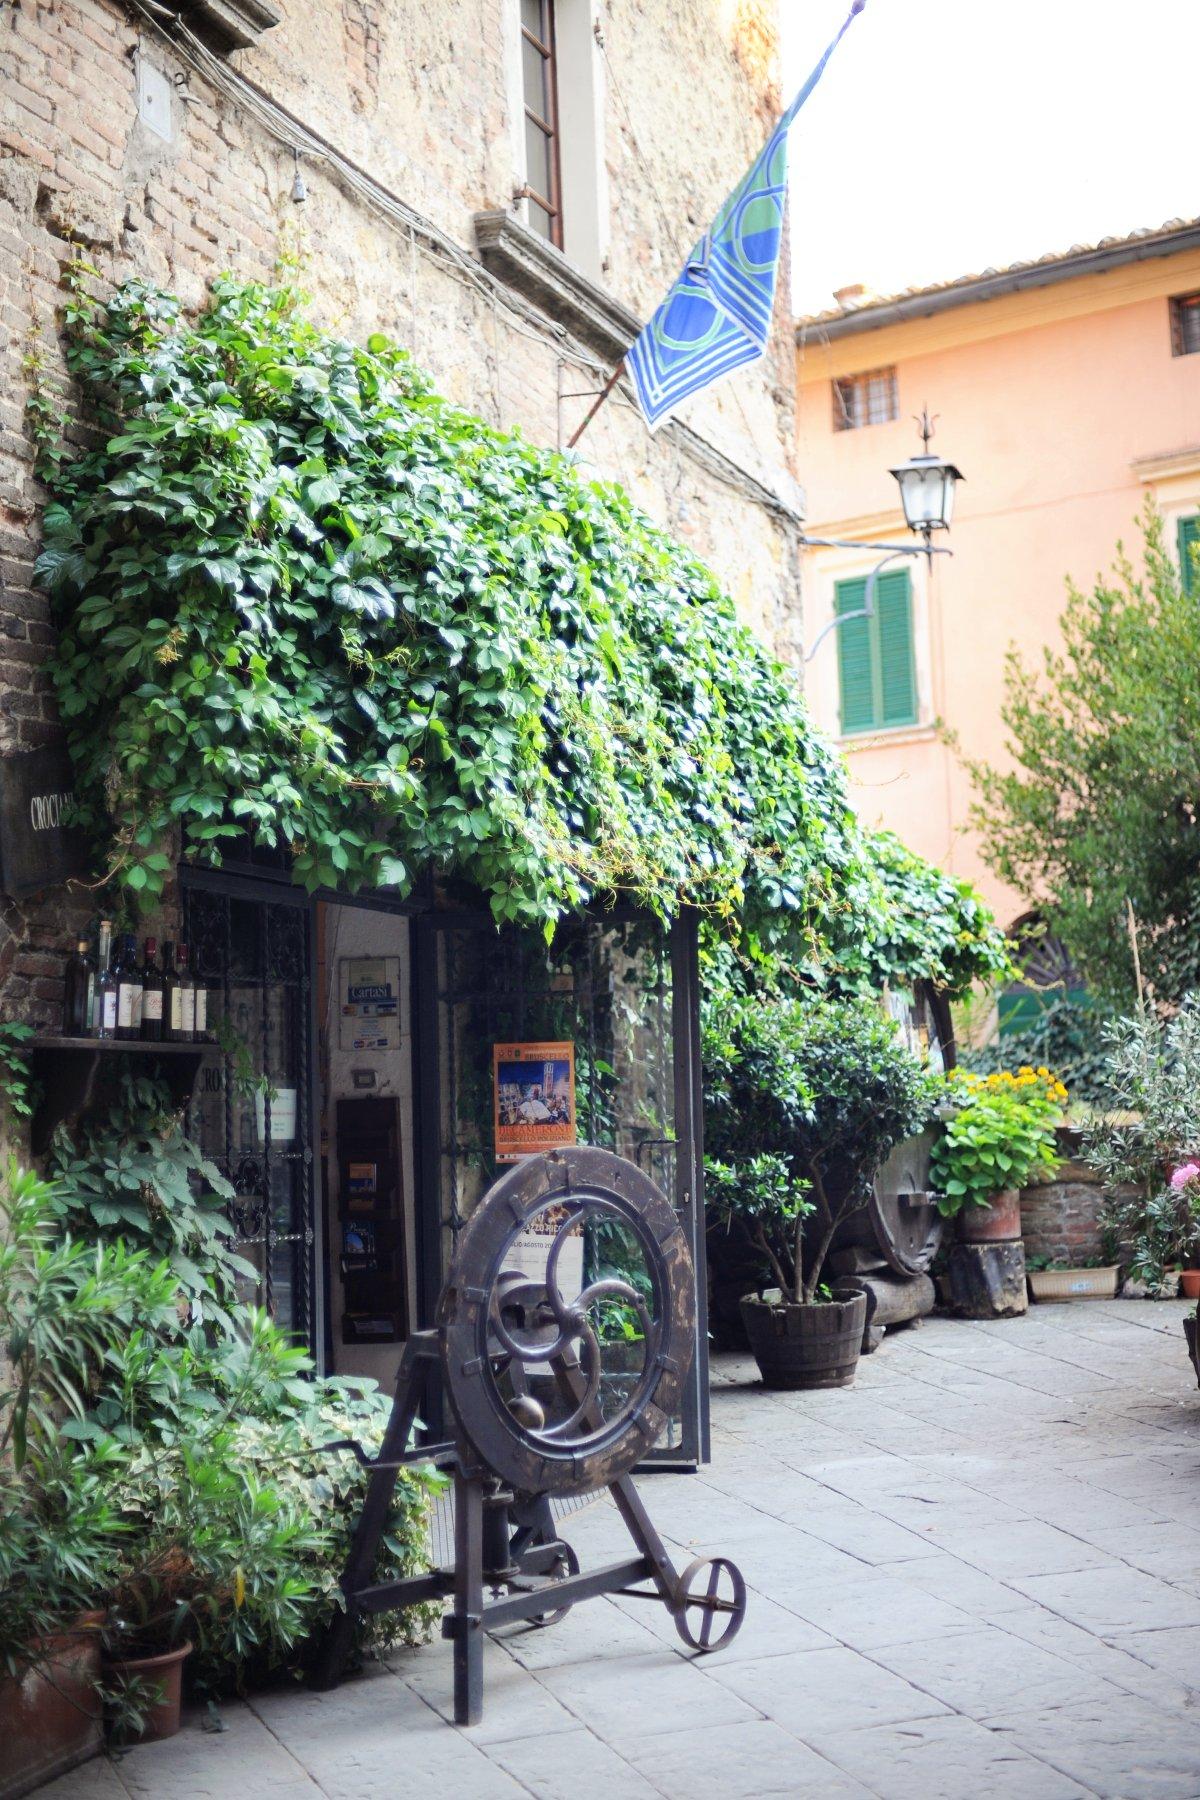 montepulciano italy travel